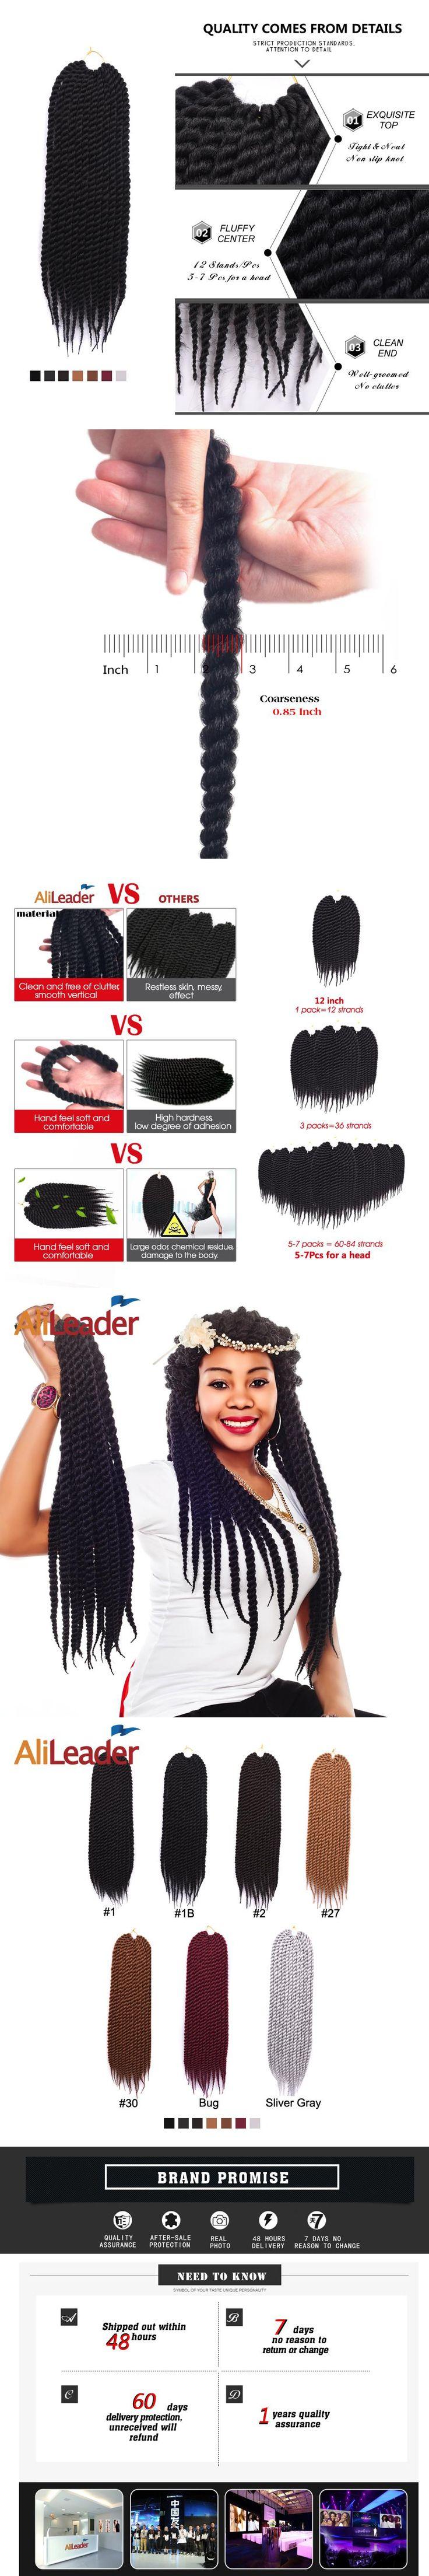 Alileader Hair Products 100% Kanekalon Hair Crochet Havana Twist Braid,  12 18 22 Inch Crochet Braids Synthetic Hair Extension